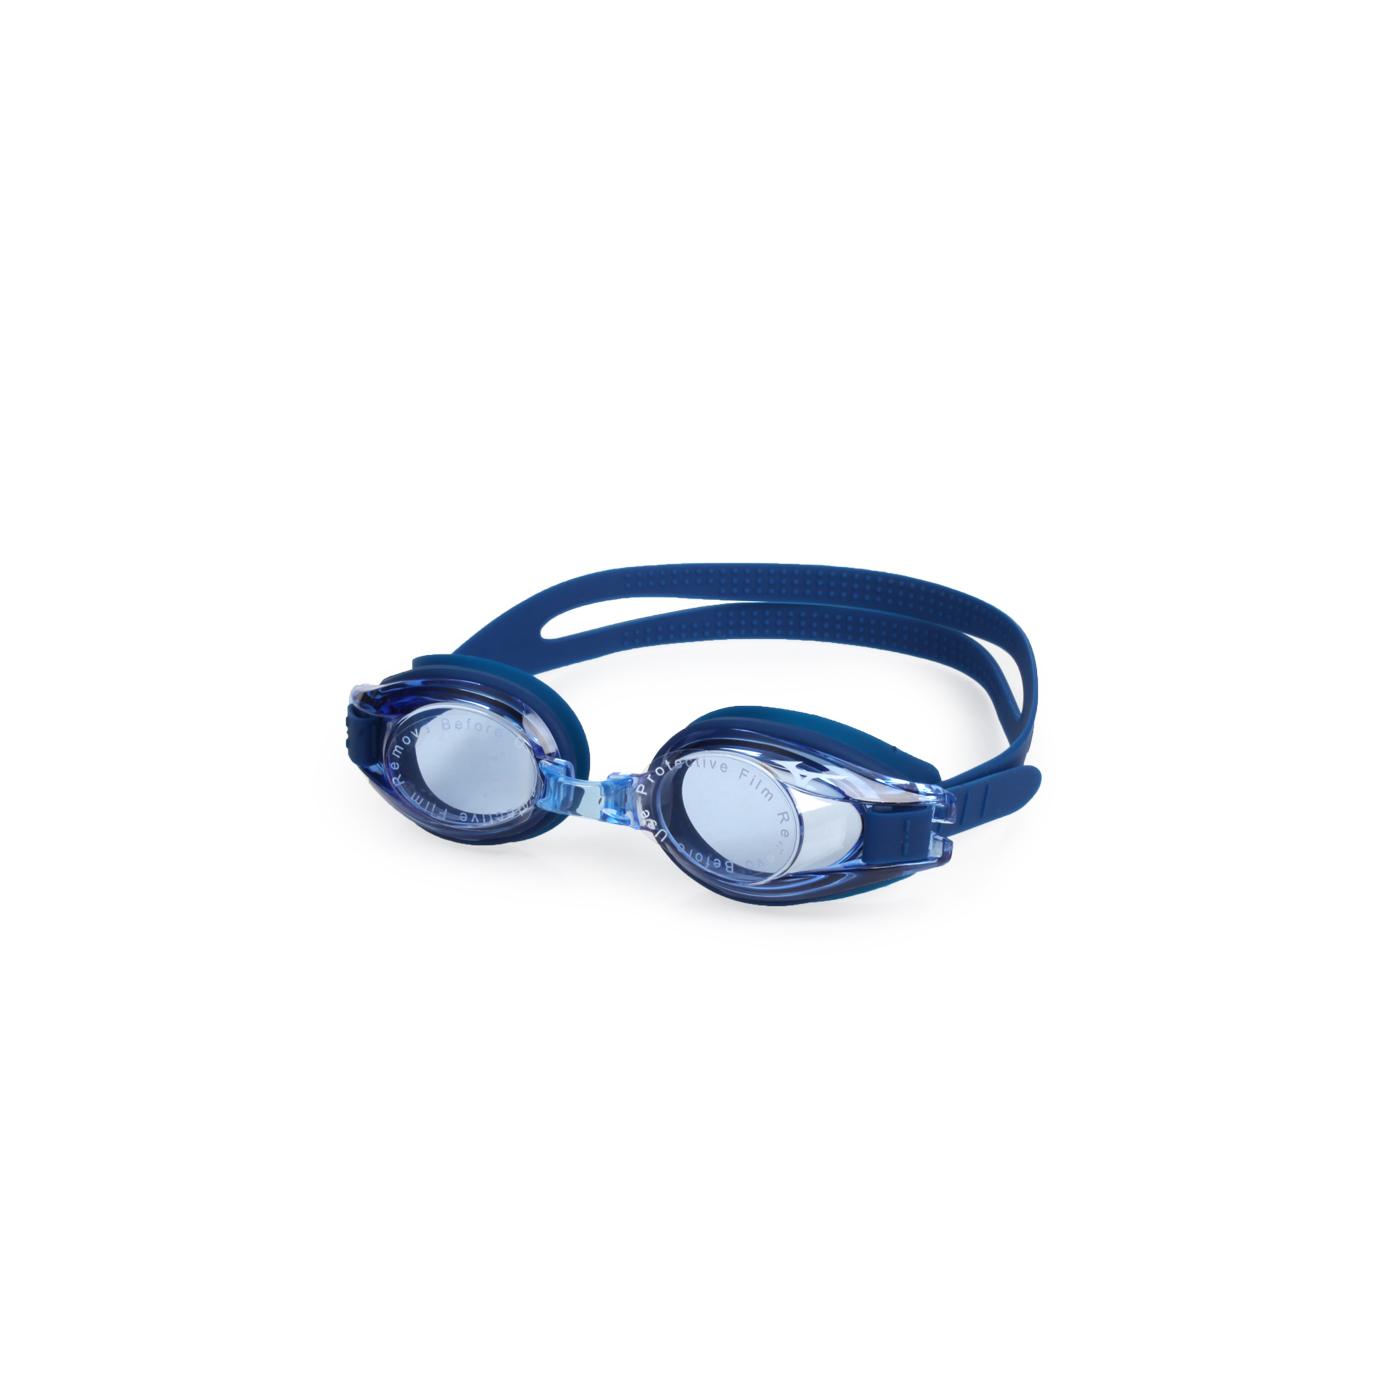 MIZUNO 兒童泳鏡  SWIMN3JF600000-09 - 藍白